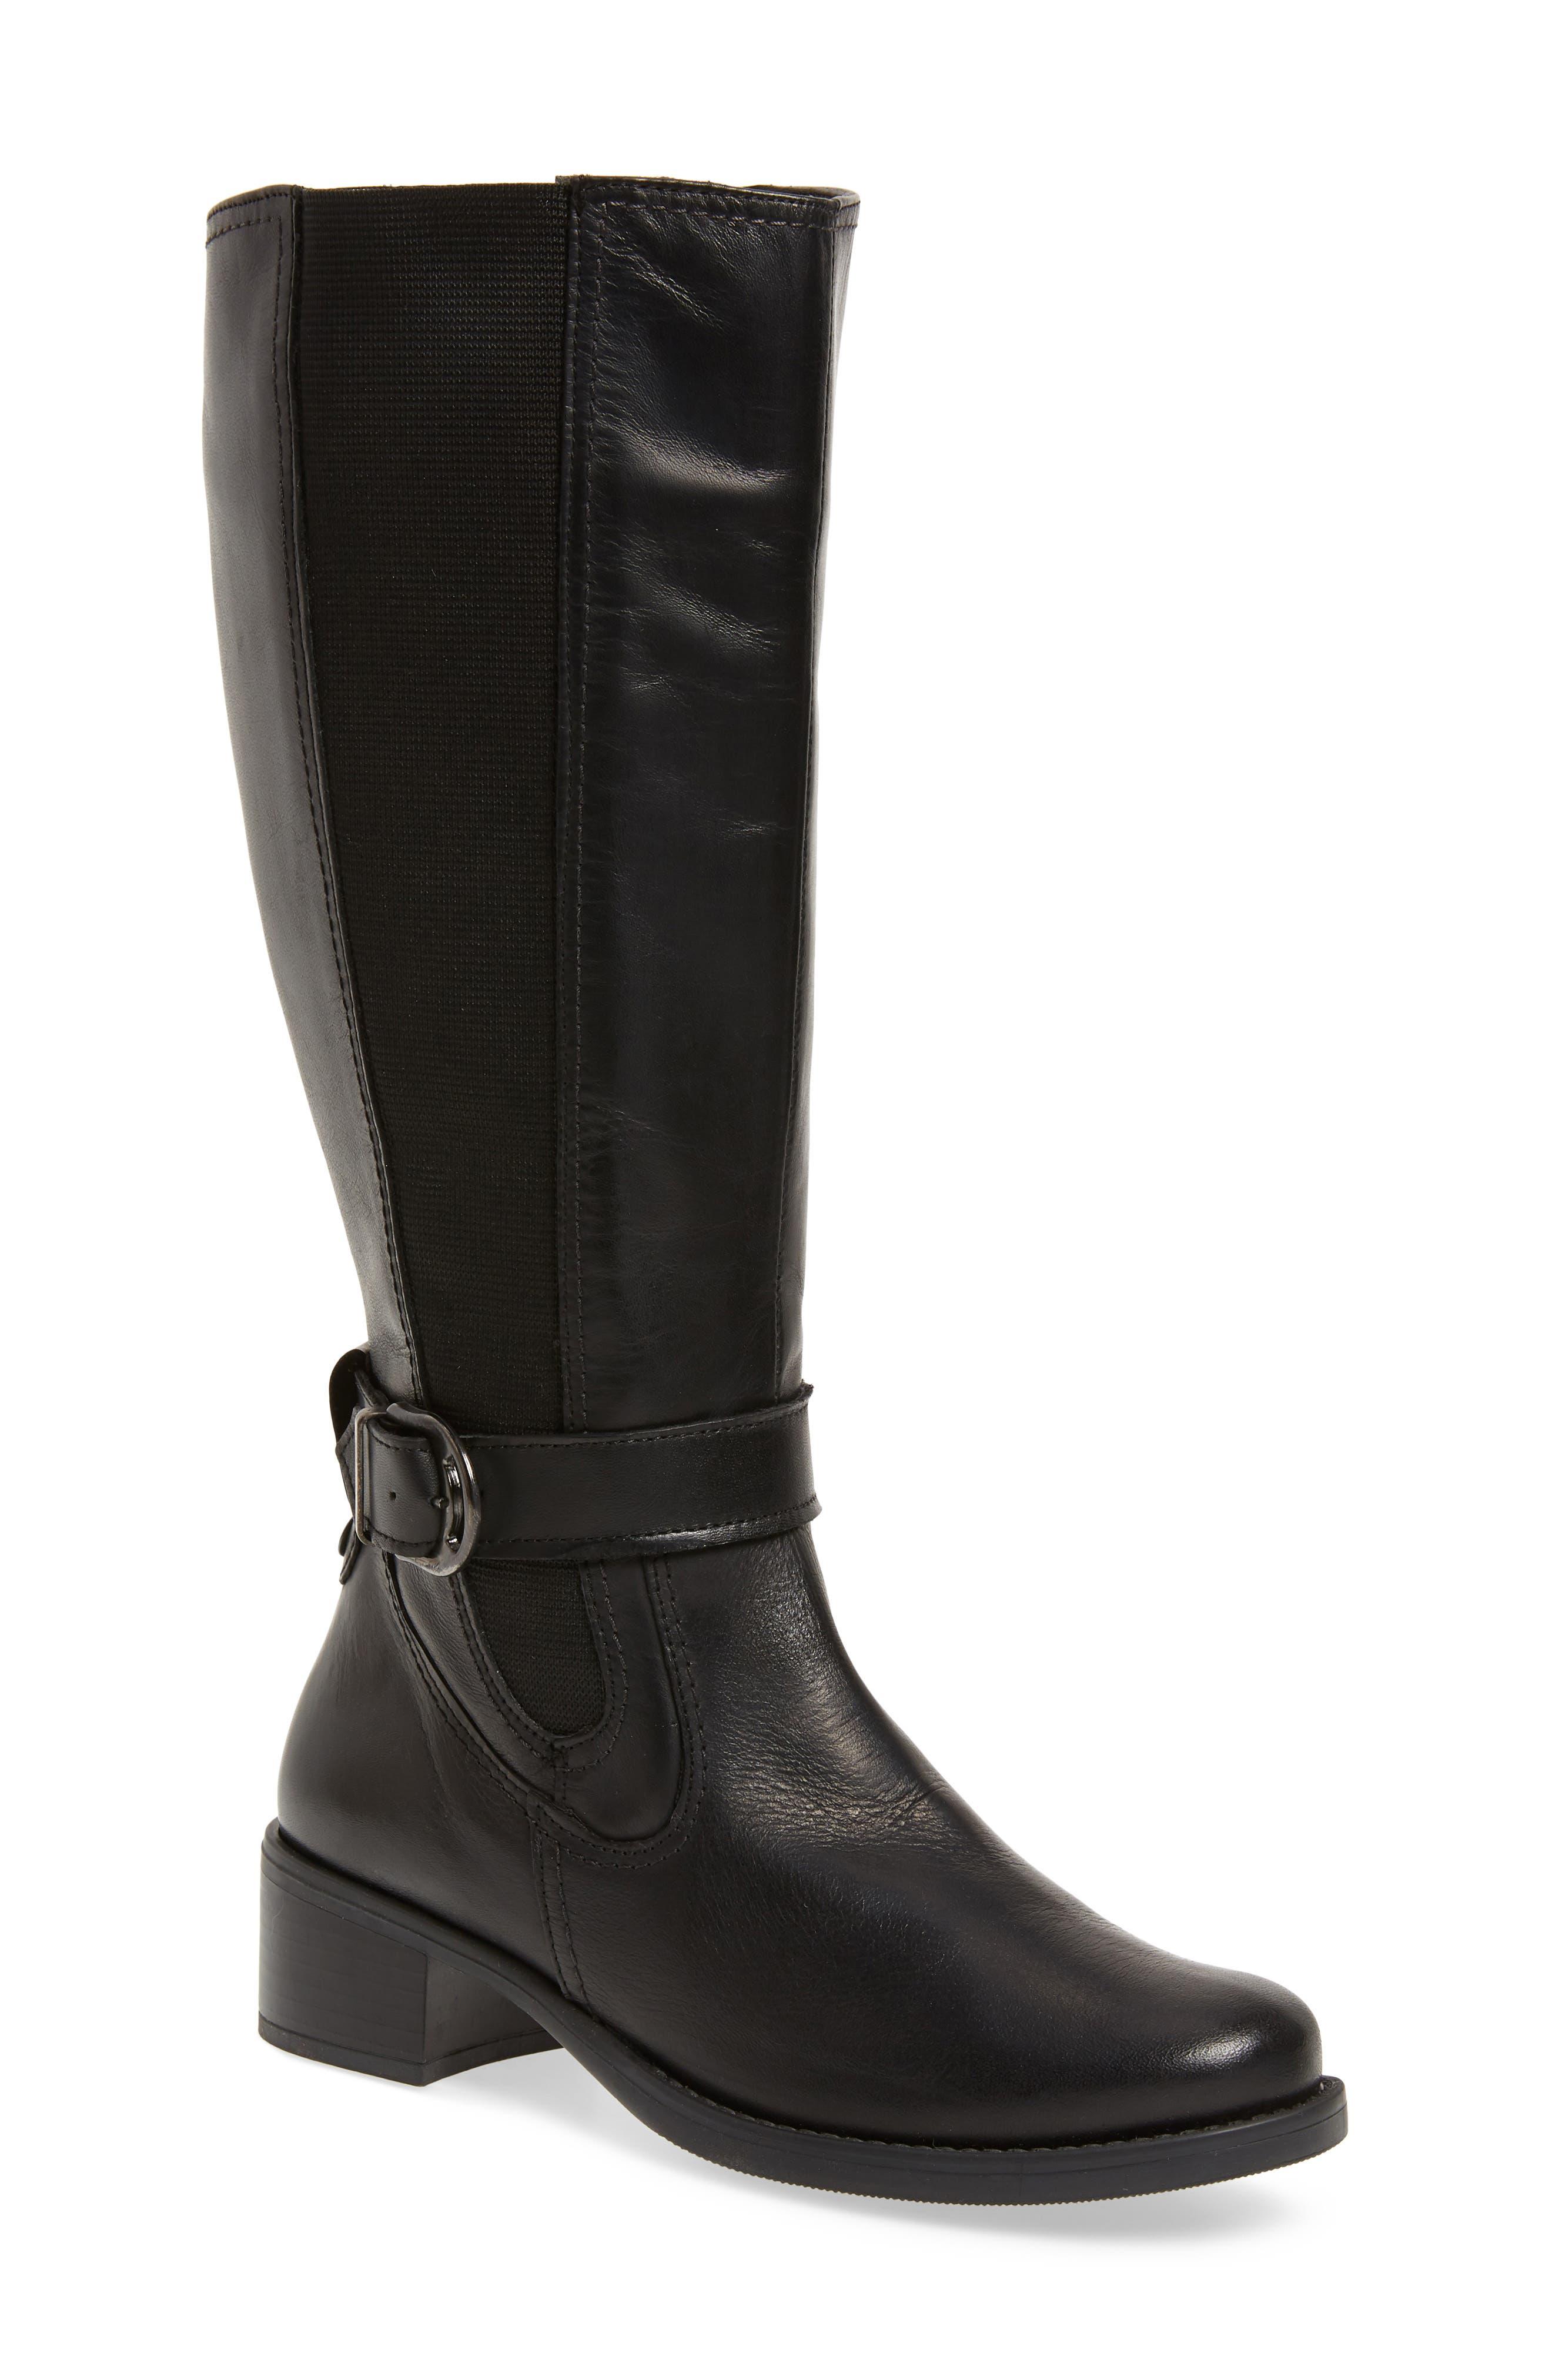 David Tate Amalfi 16 Boot- Black